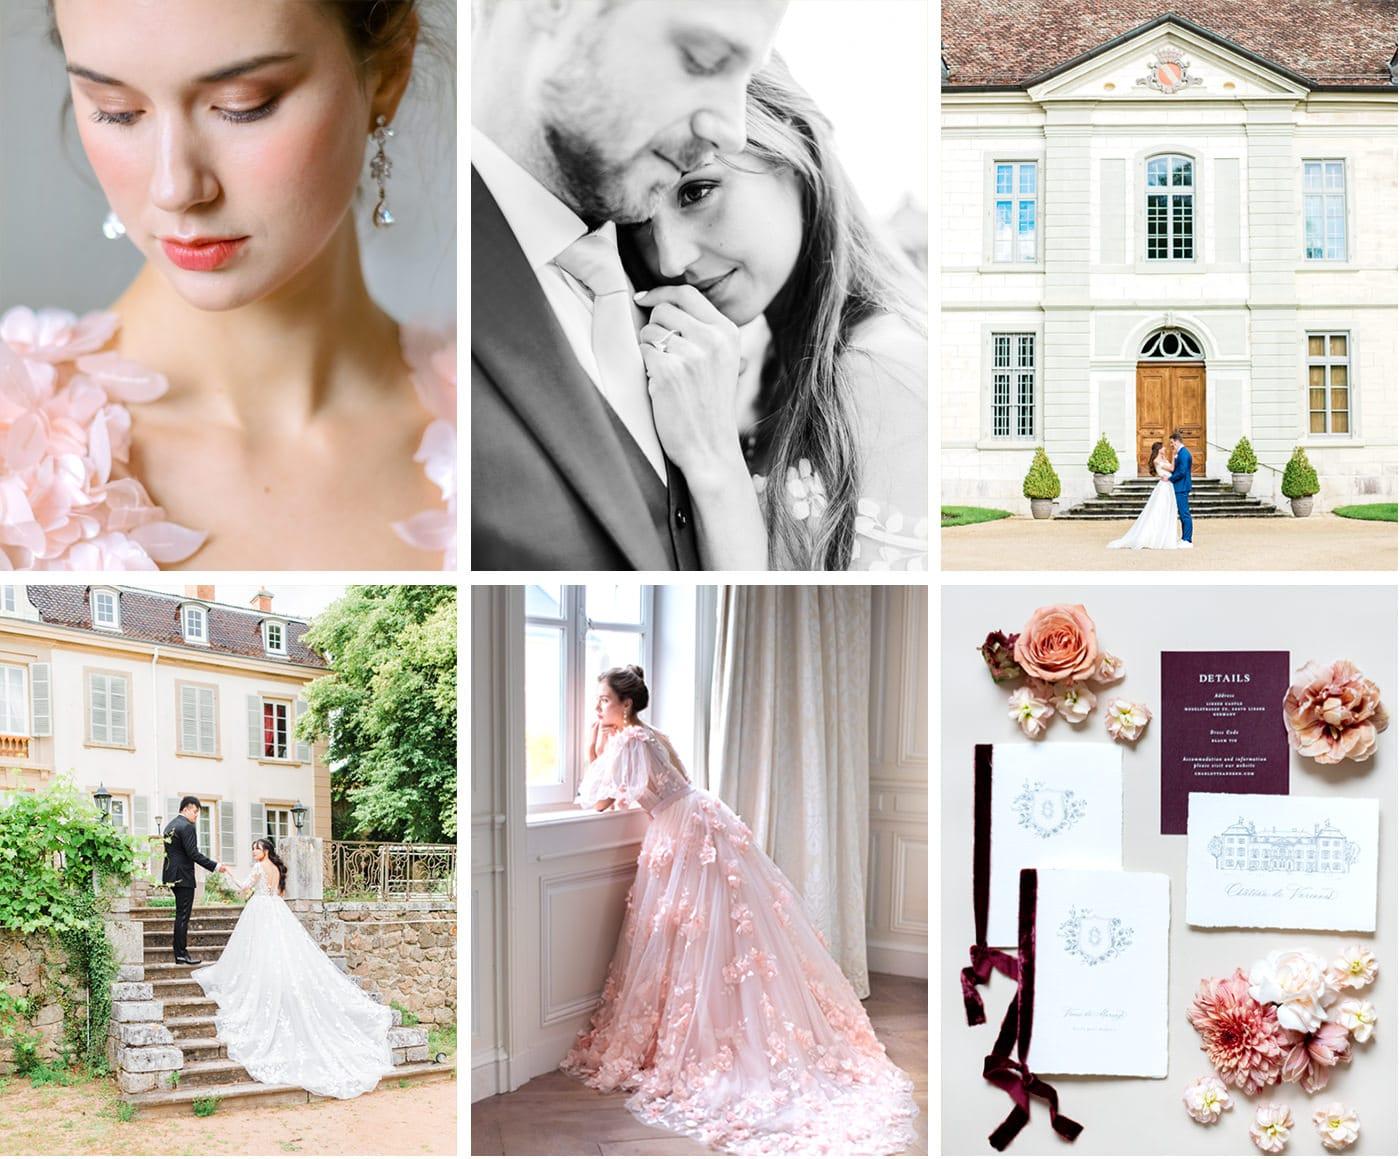 Photographe mariage lyon luxe frederick dewitte